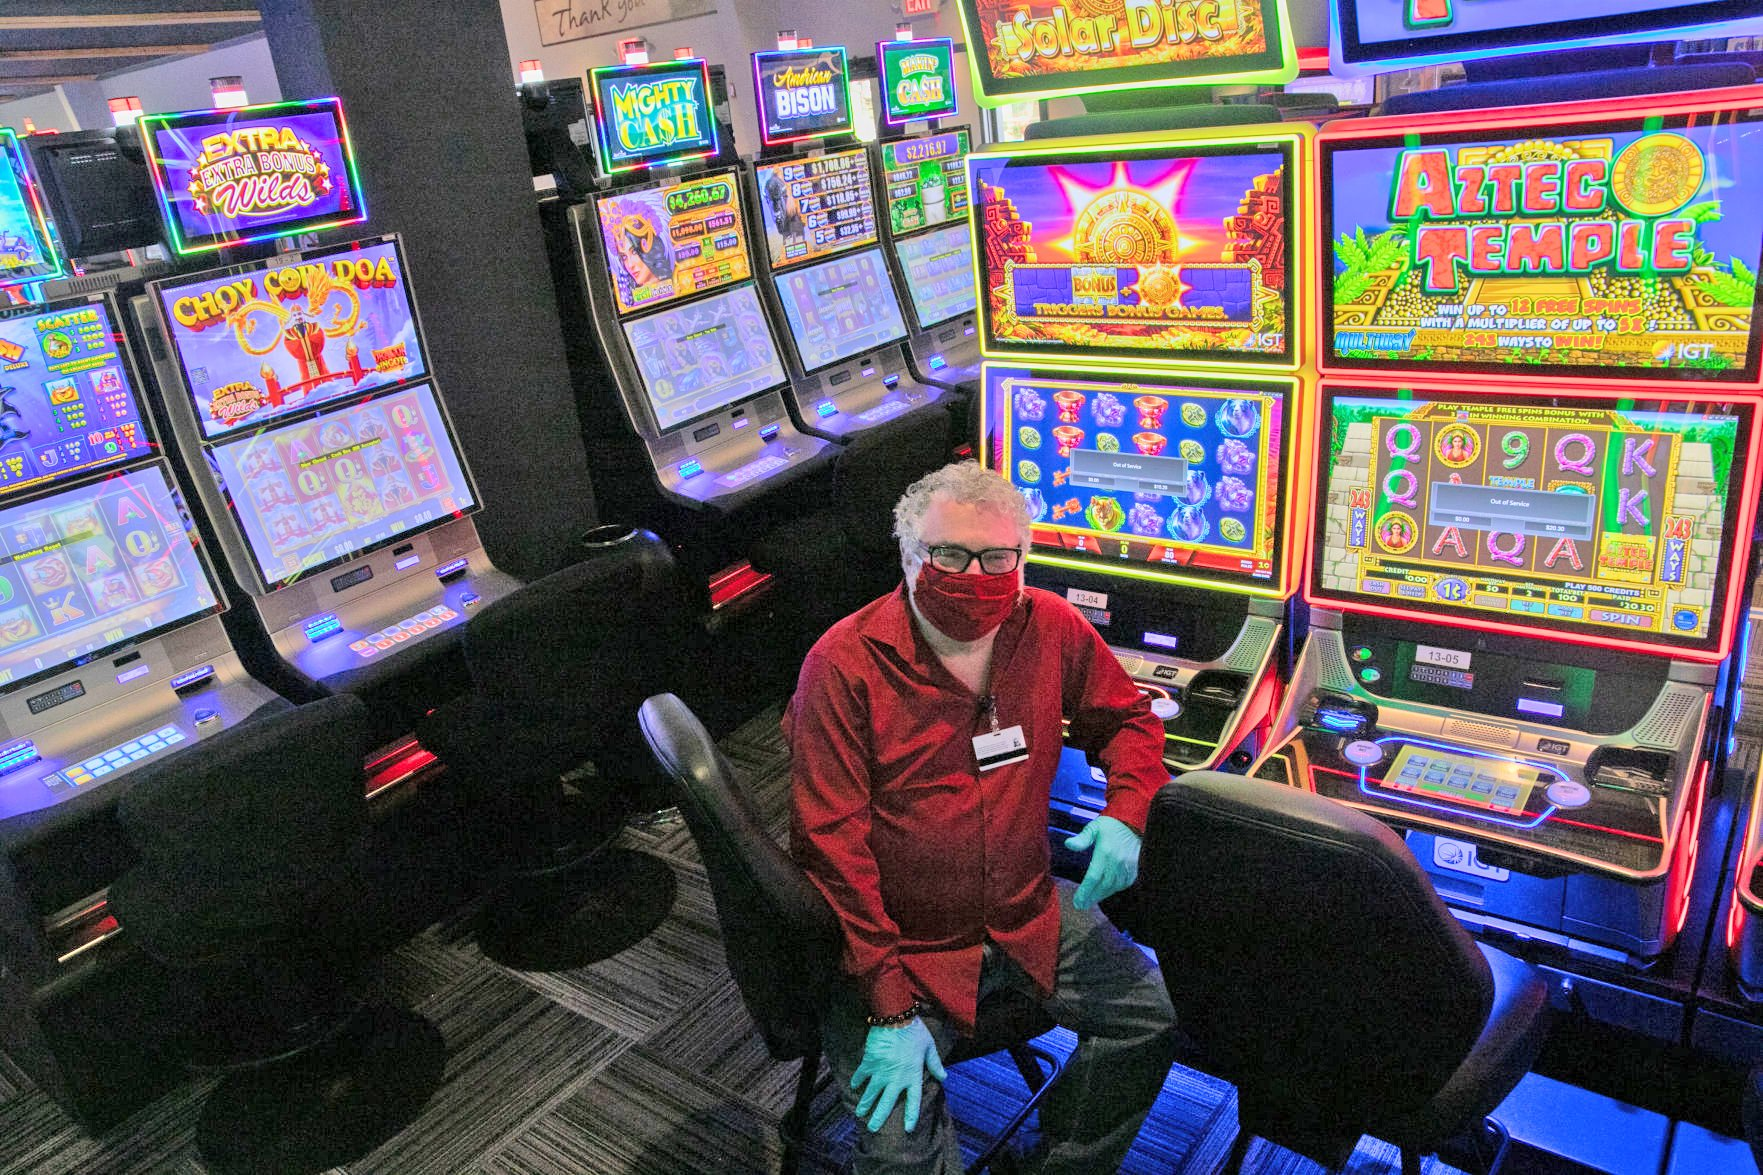 Shoalwater bay casino jobs club marian 2 games